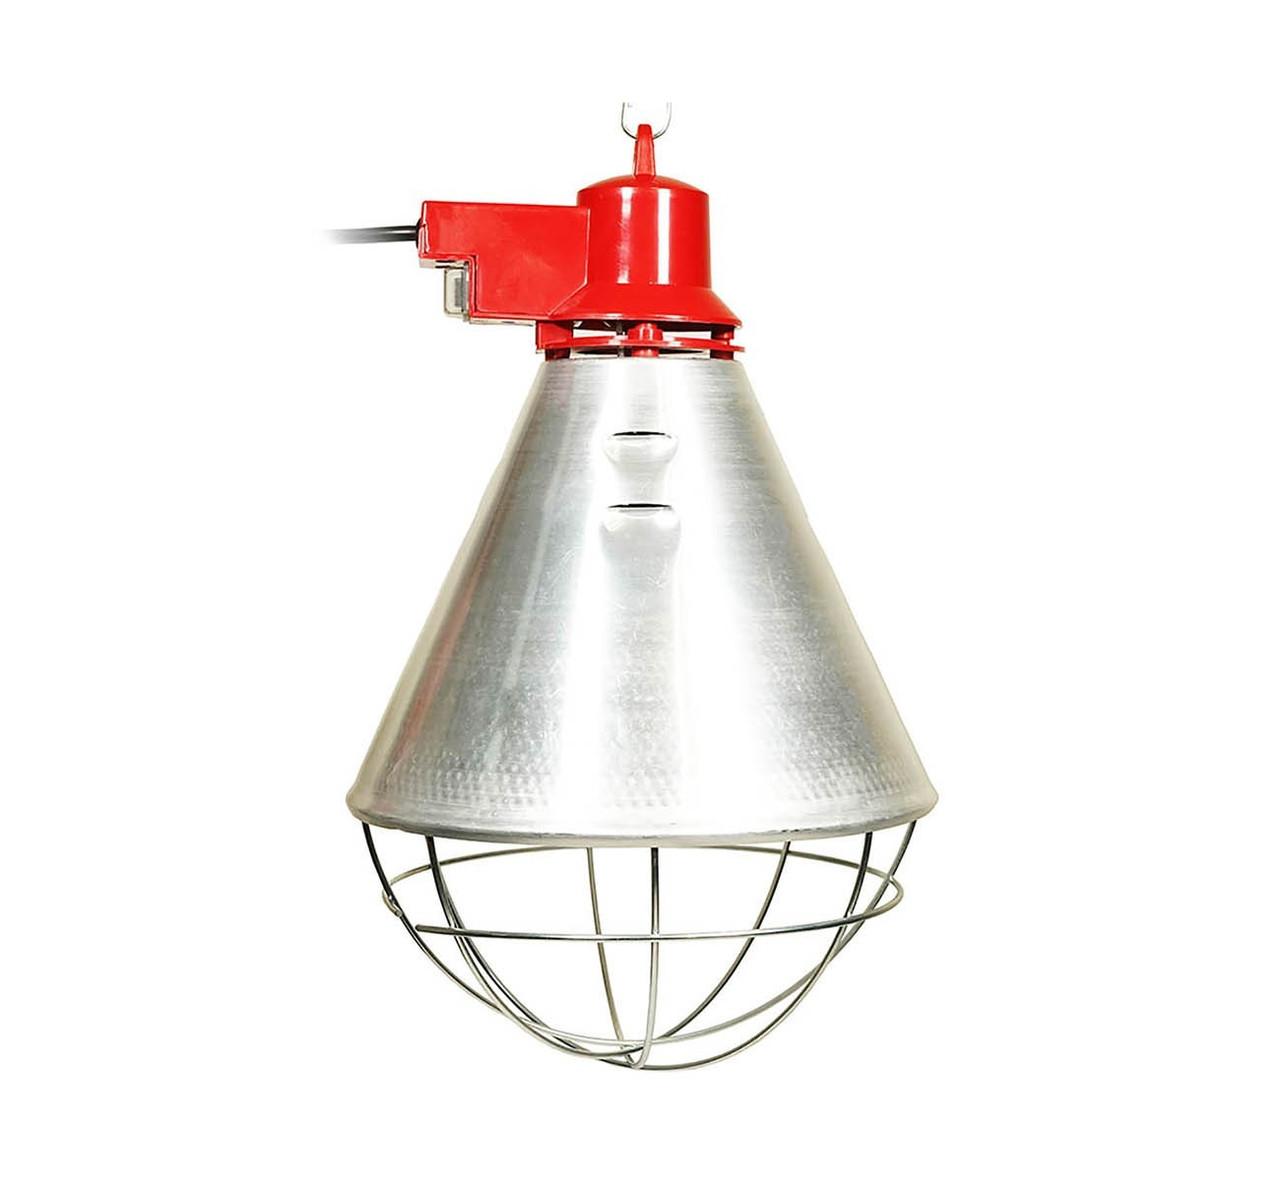 Рефлектор с галогенной лампой (абажур) Tehno MS  S1014 цвет алюминий